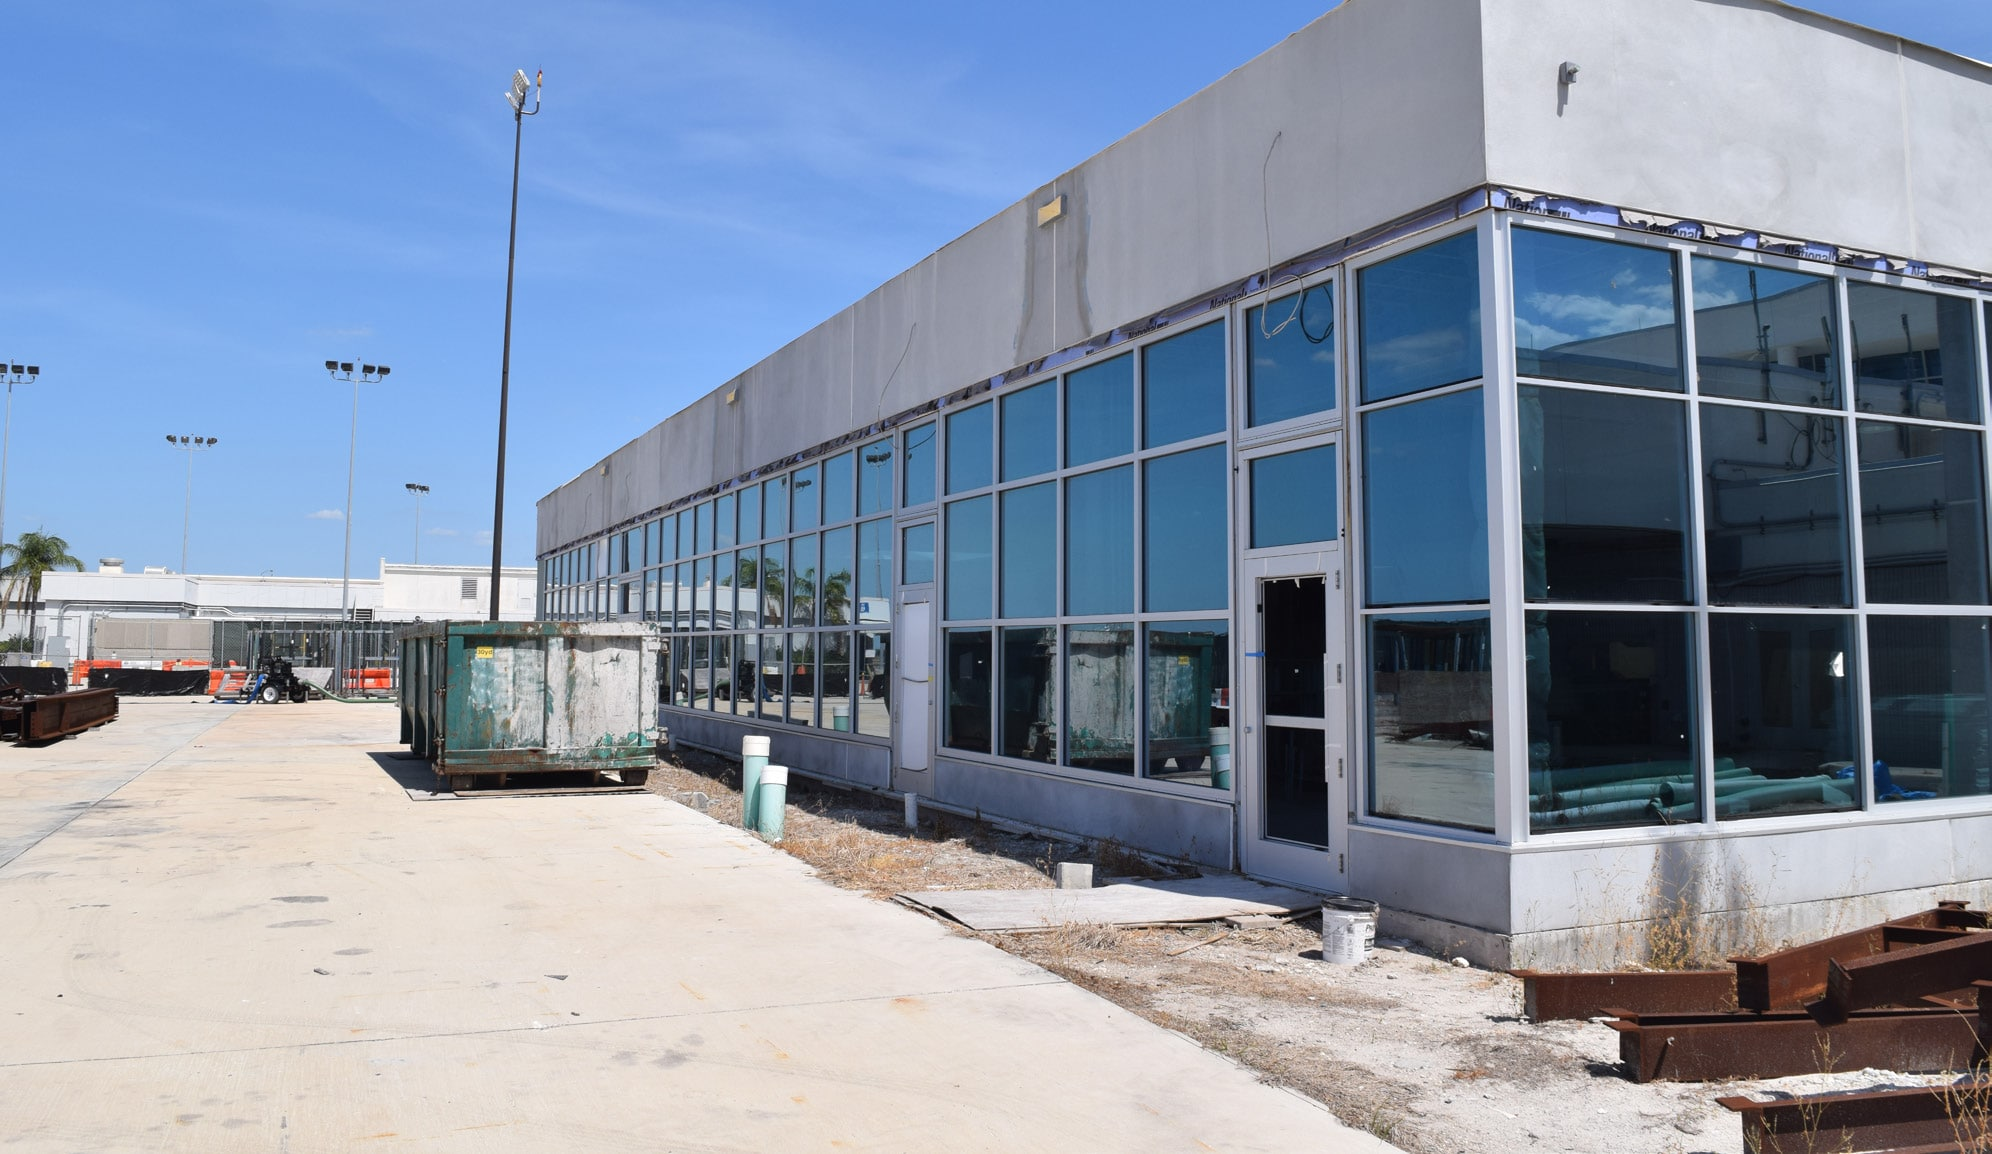 VERTEX Surety Claims Consulting, St Petersburg Airport, FL, 48534